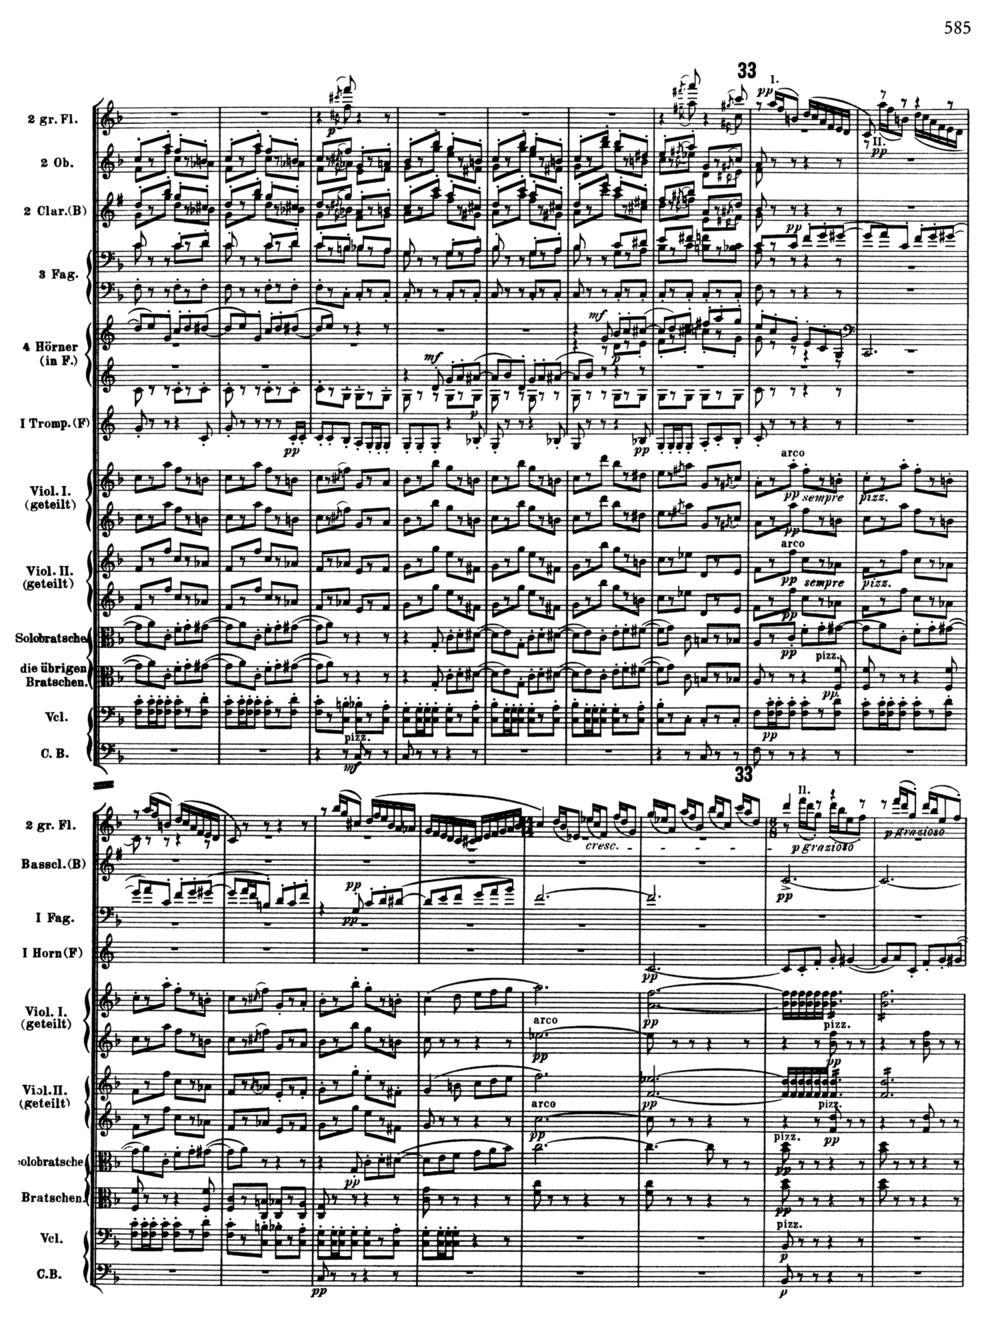 Strauss Till Eulenspiegel Score 3.jpg